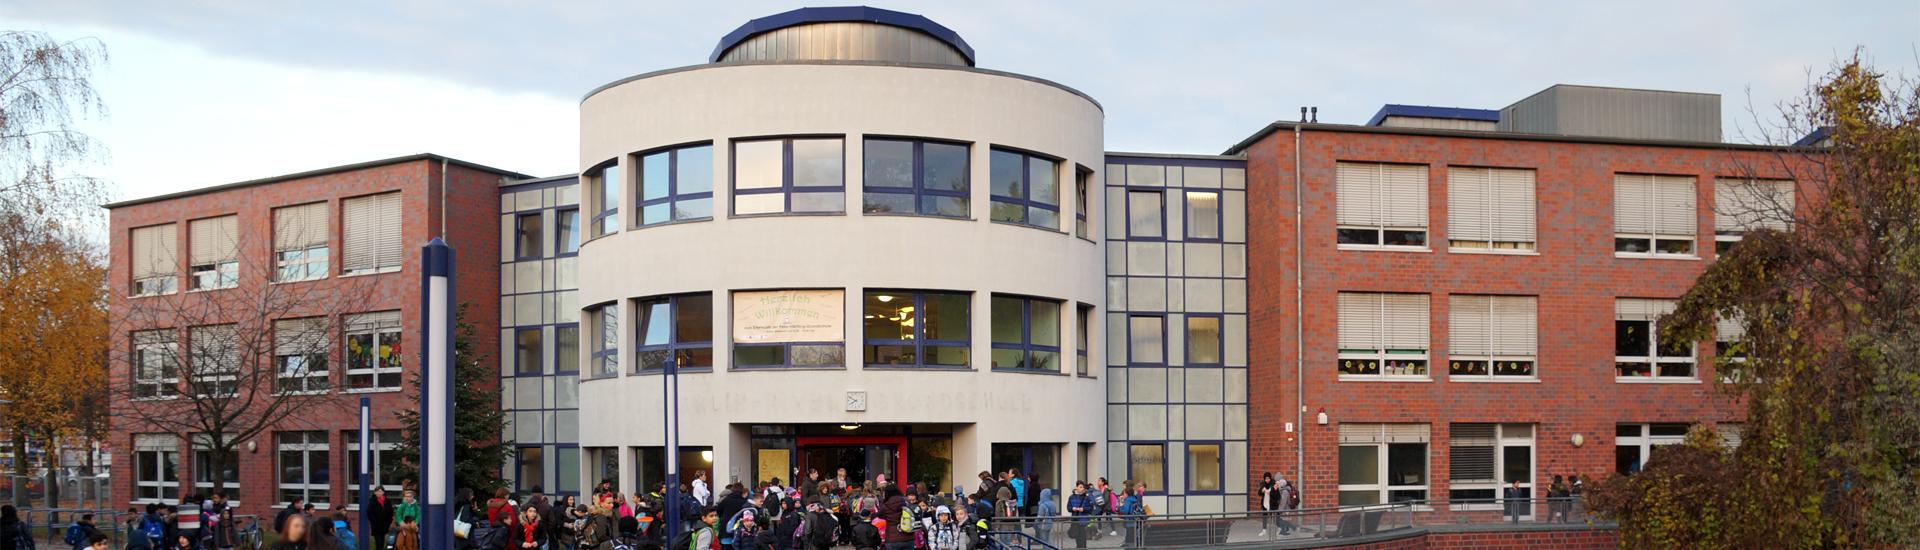 Peter-Härtling-Grundschule